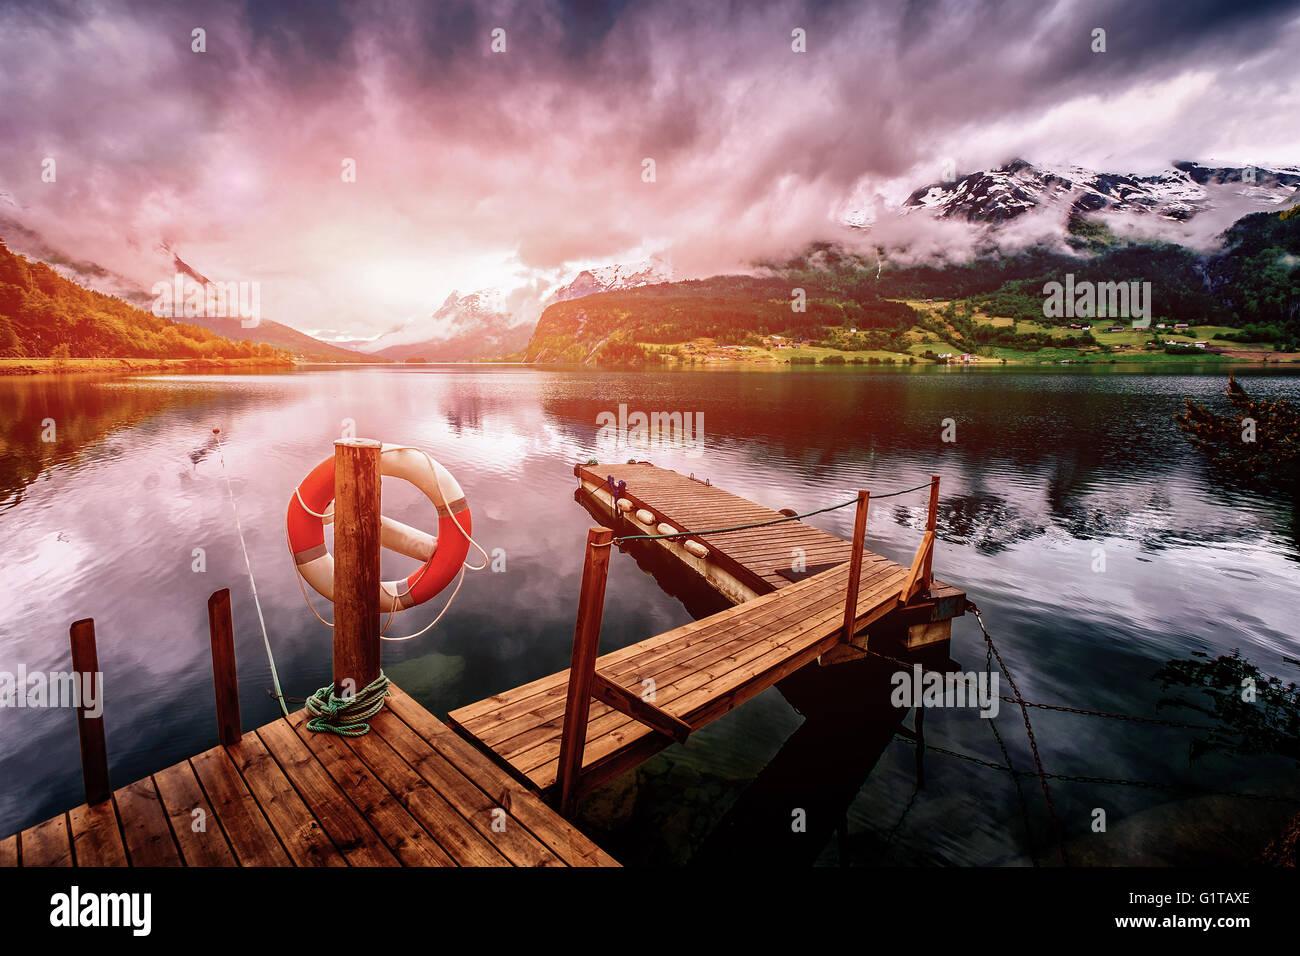 Hermosa naturaleza noruega paisaje natural. Filtro aplicado en post-producción. Imagen De Stock